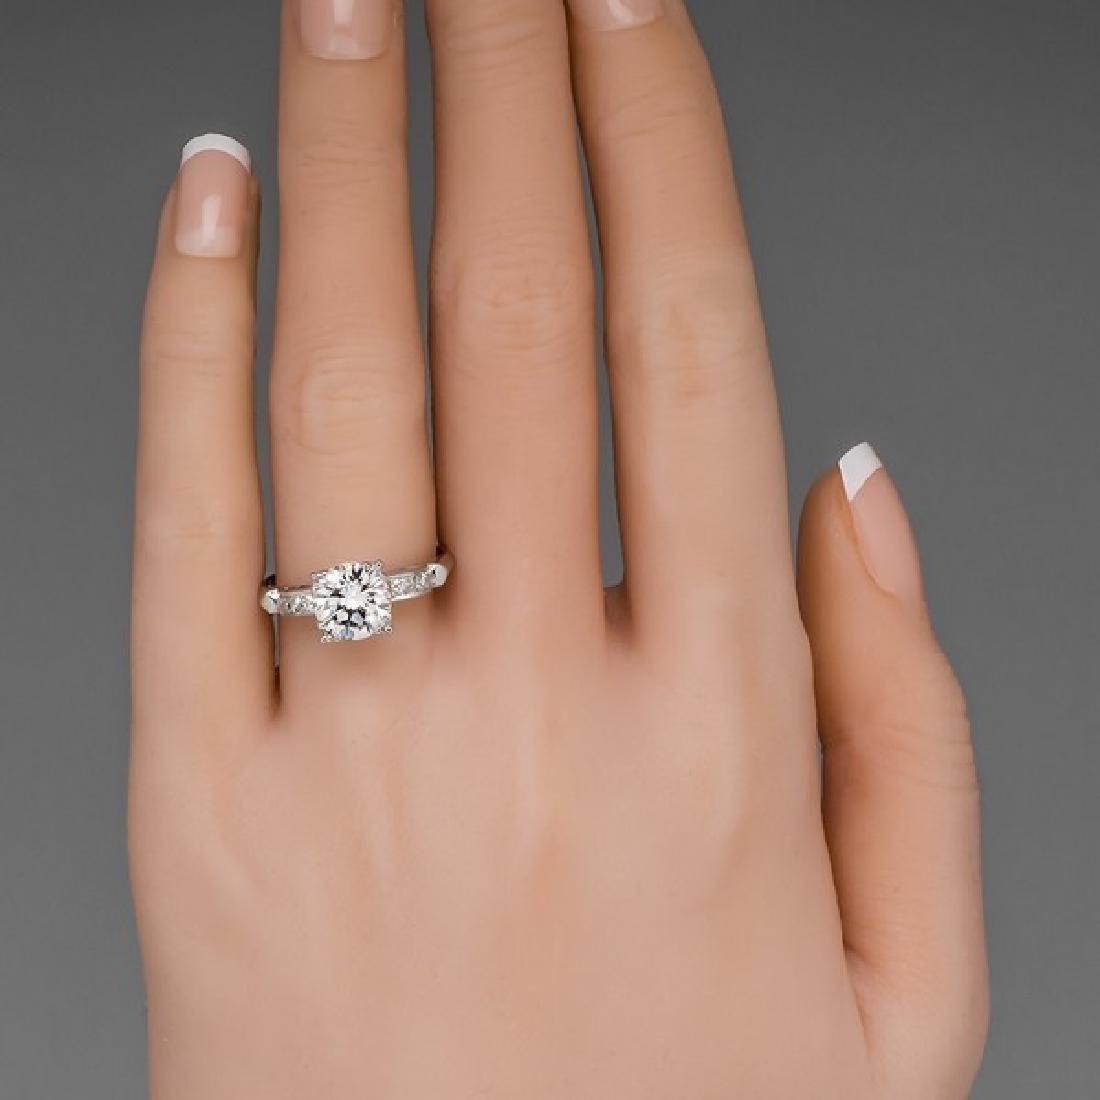 VINTAGE PLATINUM GIA DIAMOND ENGAGEMENT RING - 5